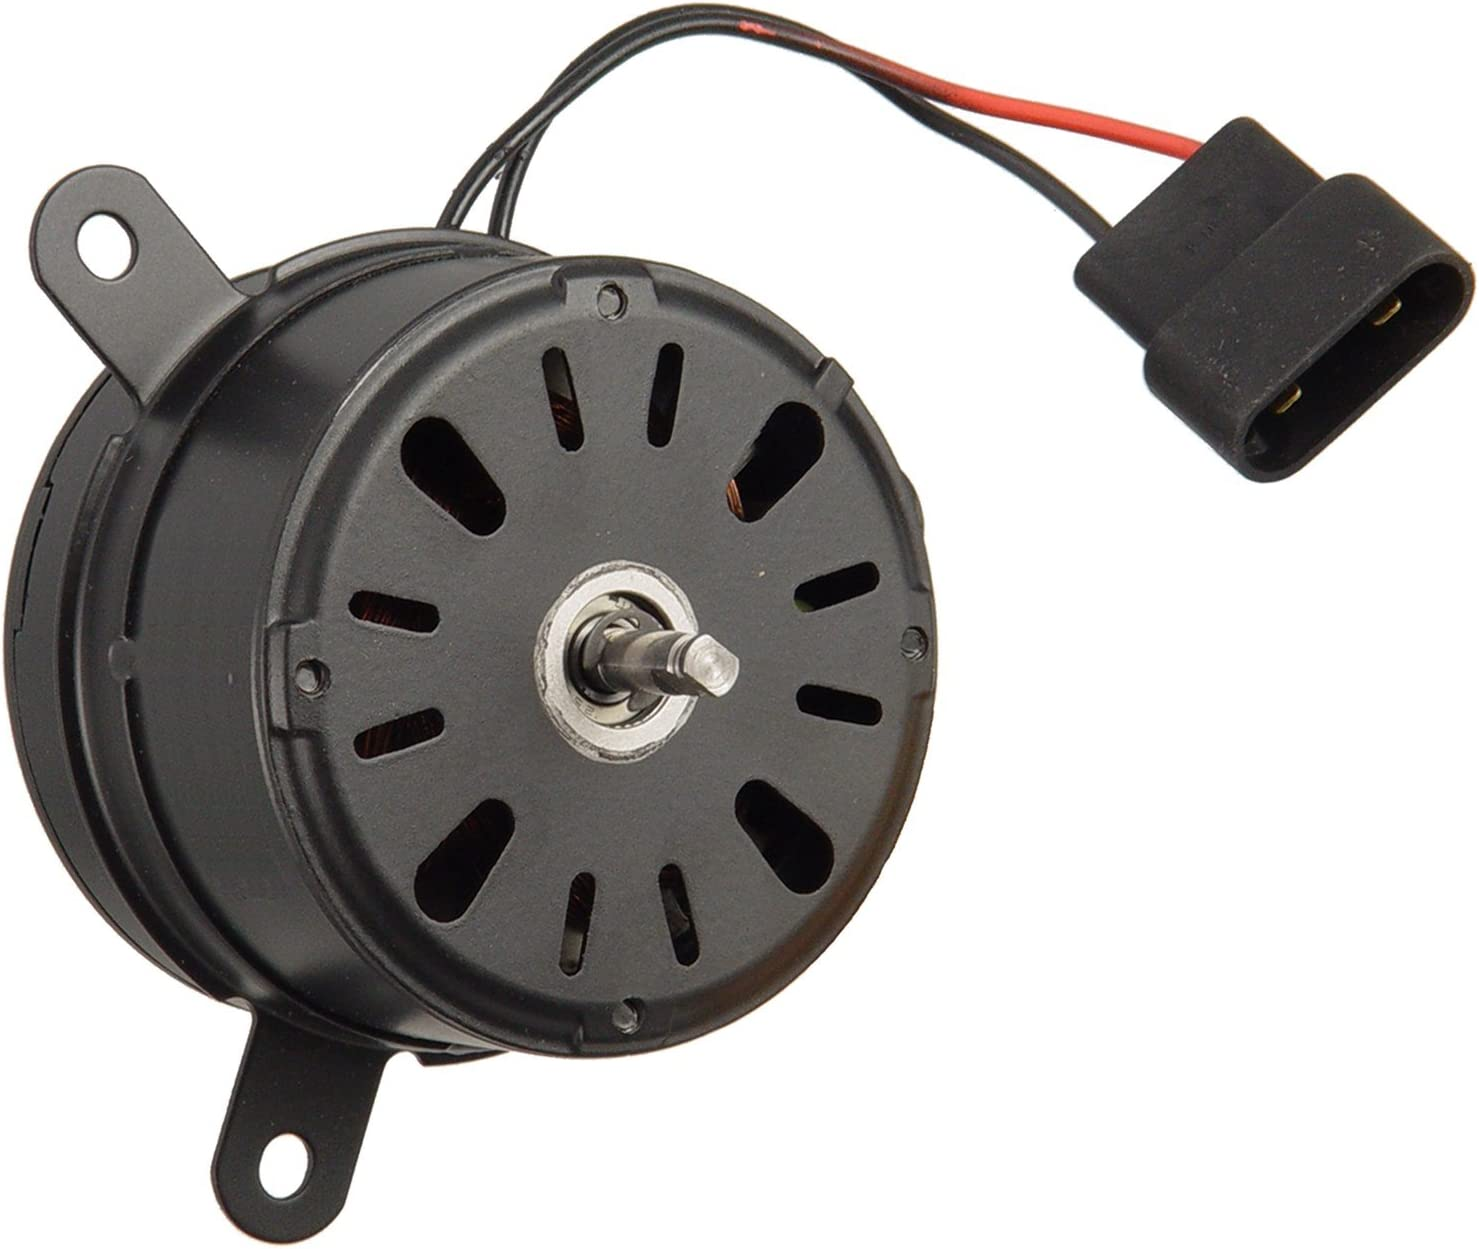 VDO PM9033 Radiator Fan Motor